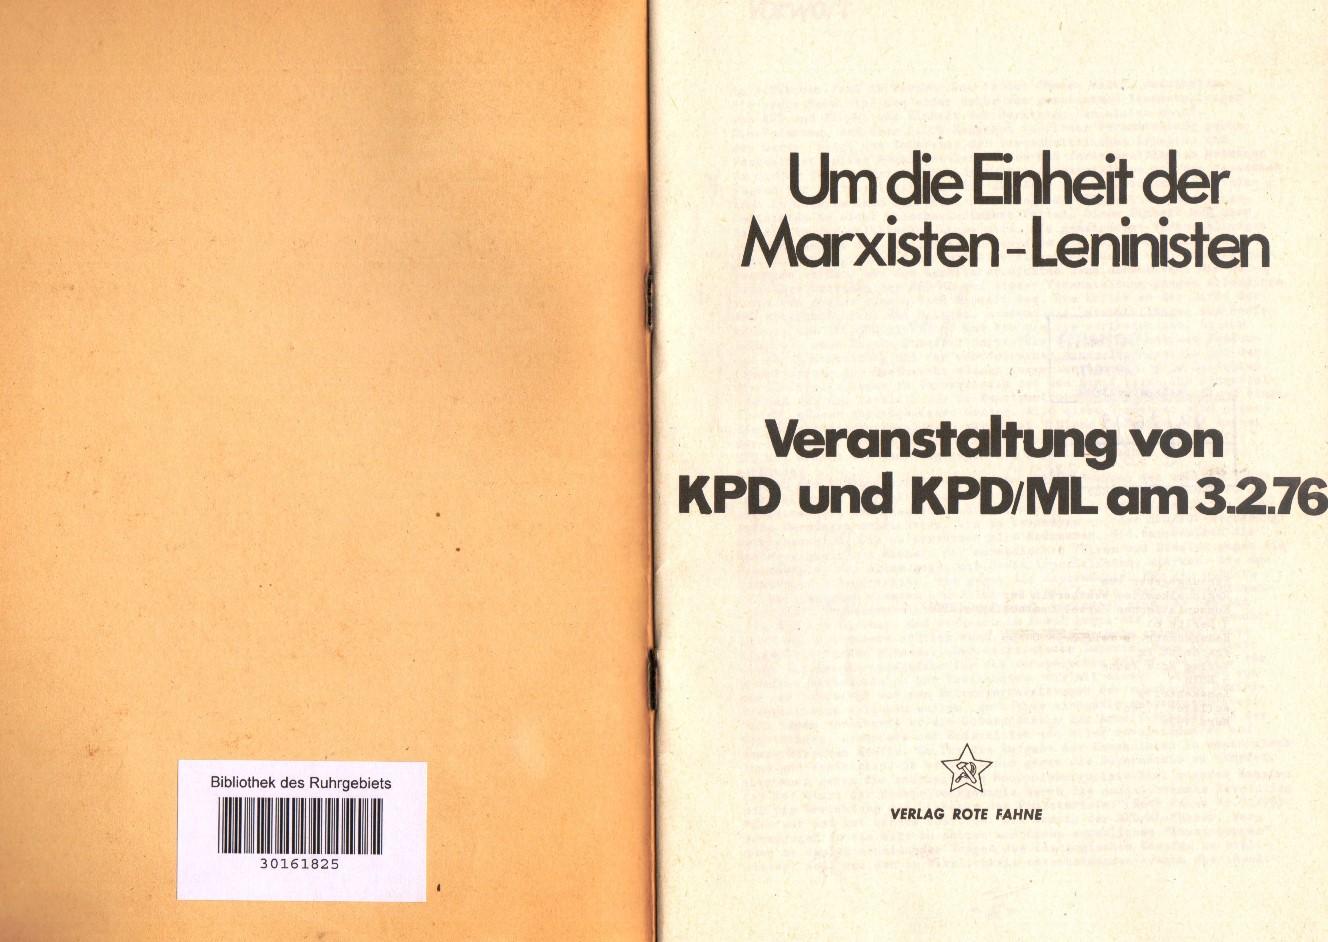 Berlin_AO_1976_Veranstaltung_mit_KPDML_02